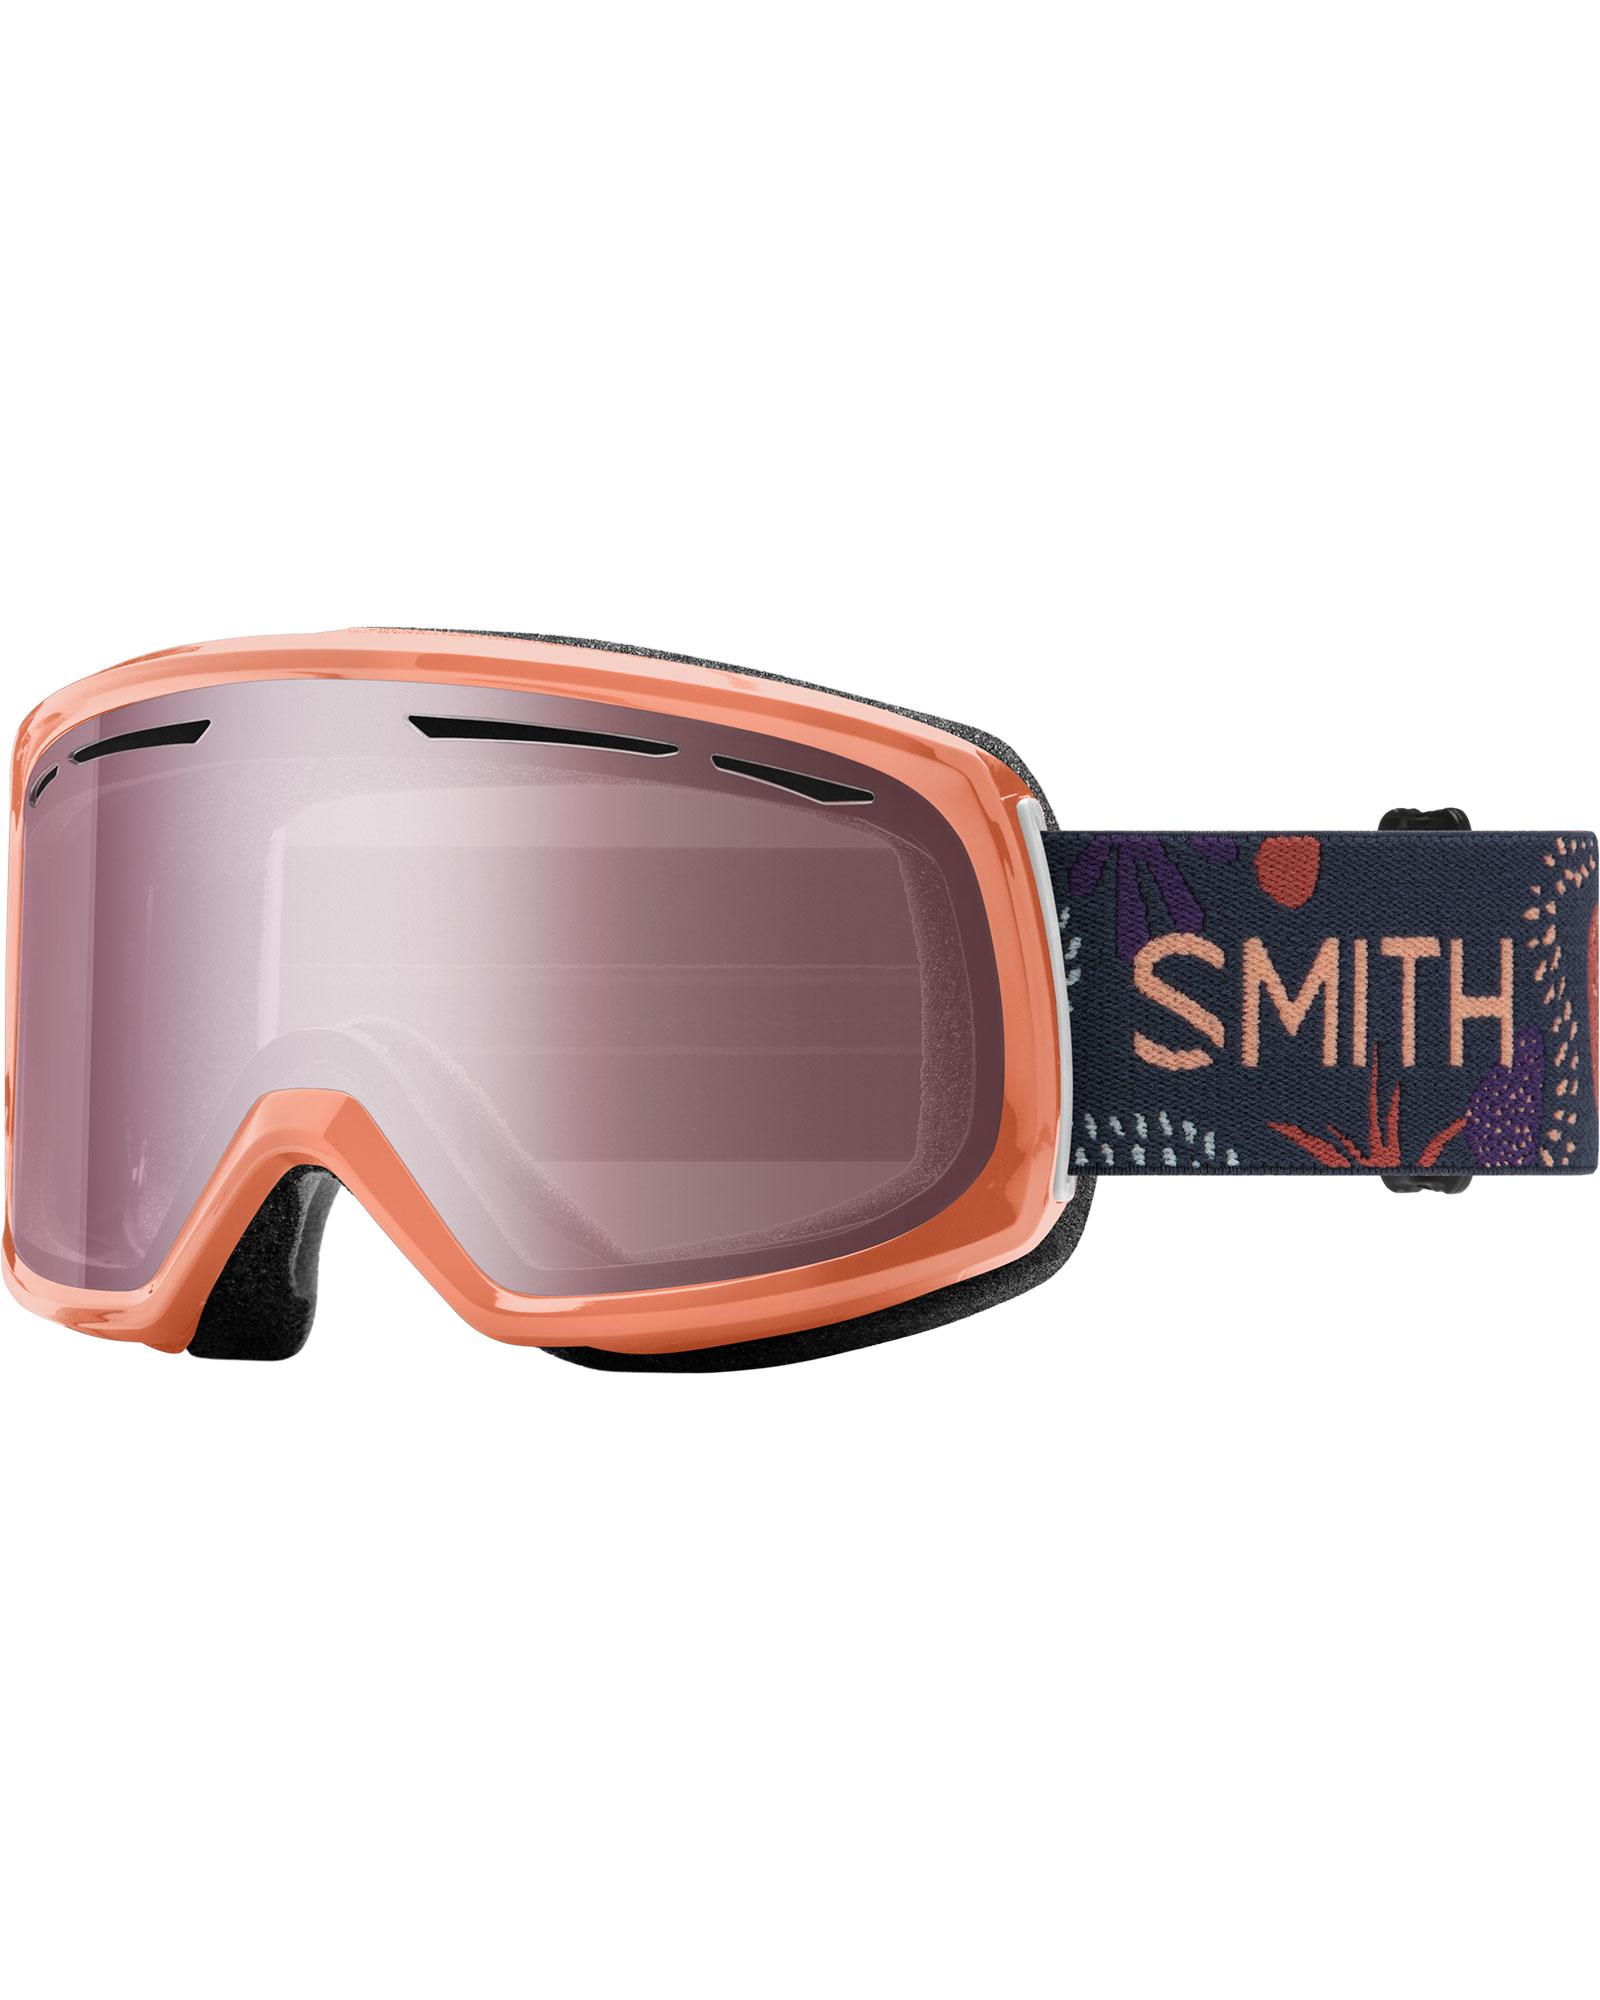 Smith Women's Drift Salmon Bedrock / Ignitor Mirror Goggles 2020 / 2021 0